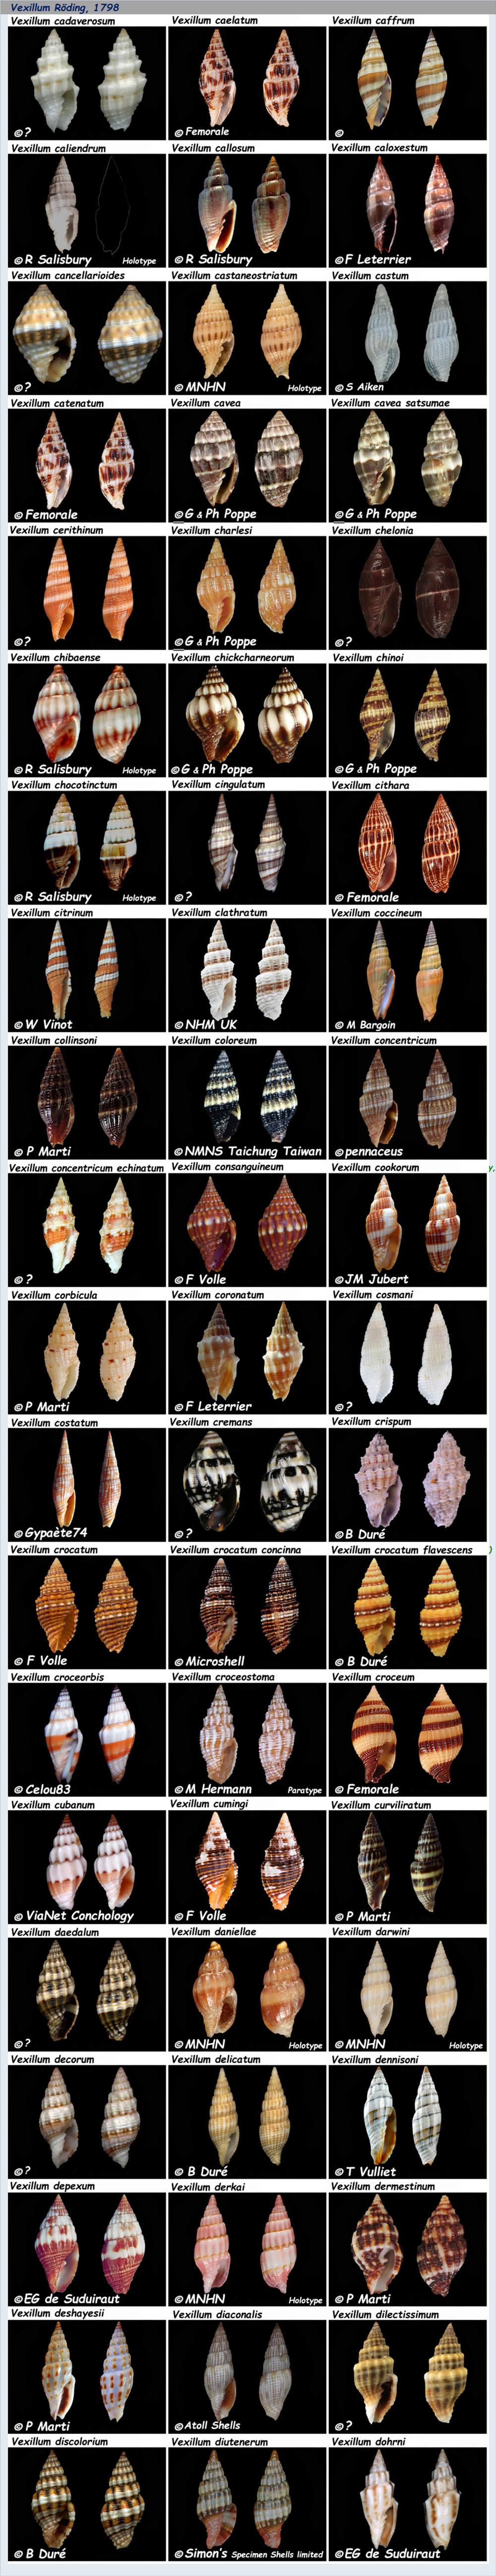 Costellariidae Vexillum C & D - Le genre, les espèces, la planche N° 2 Costel38